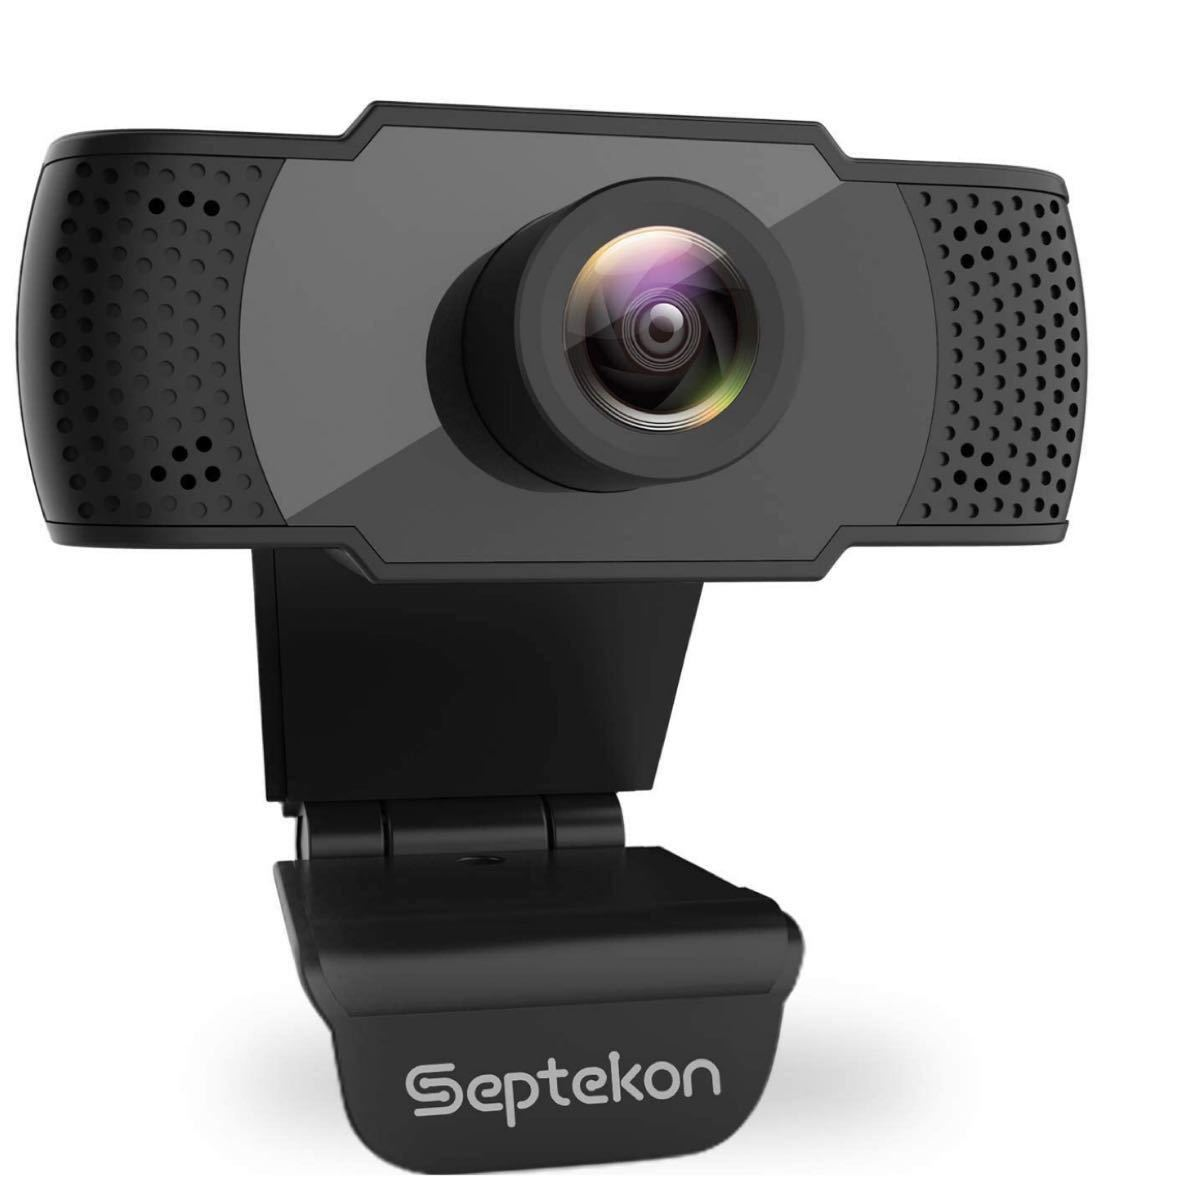 webカメラ 1080P高画質USBカメラ ウェブカメラ 在宅勤務 PCカメラ